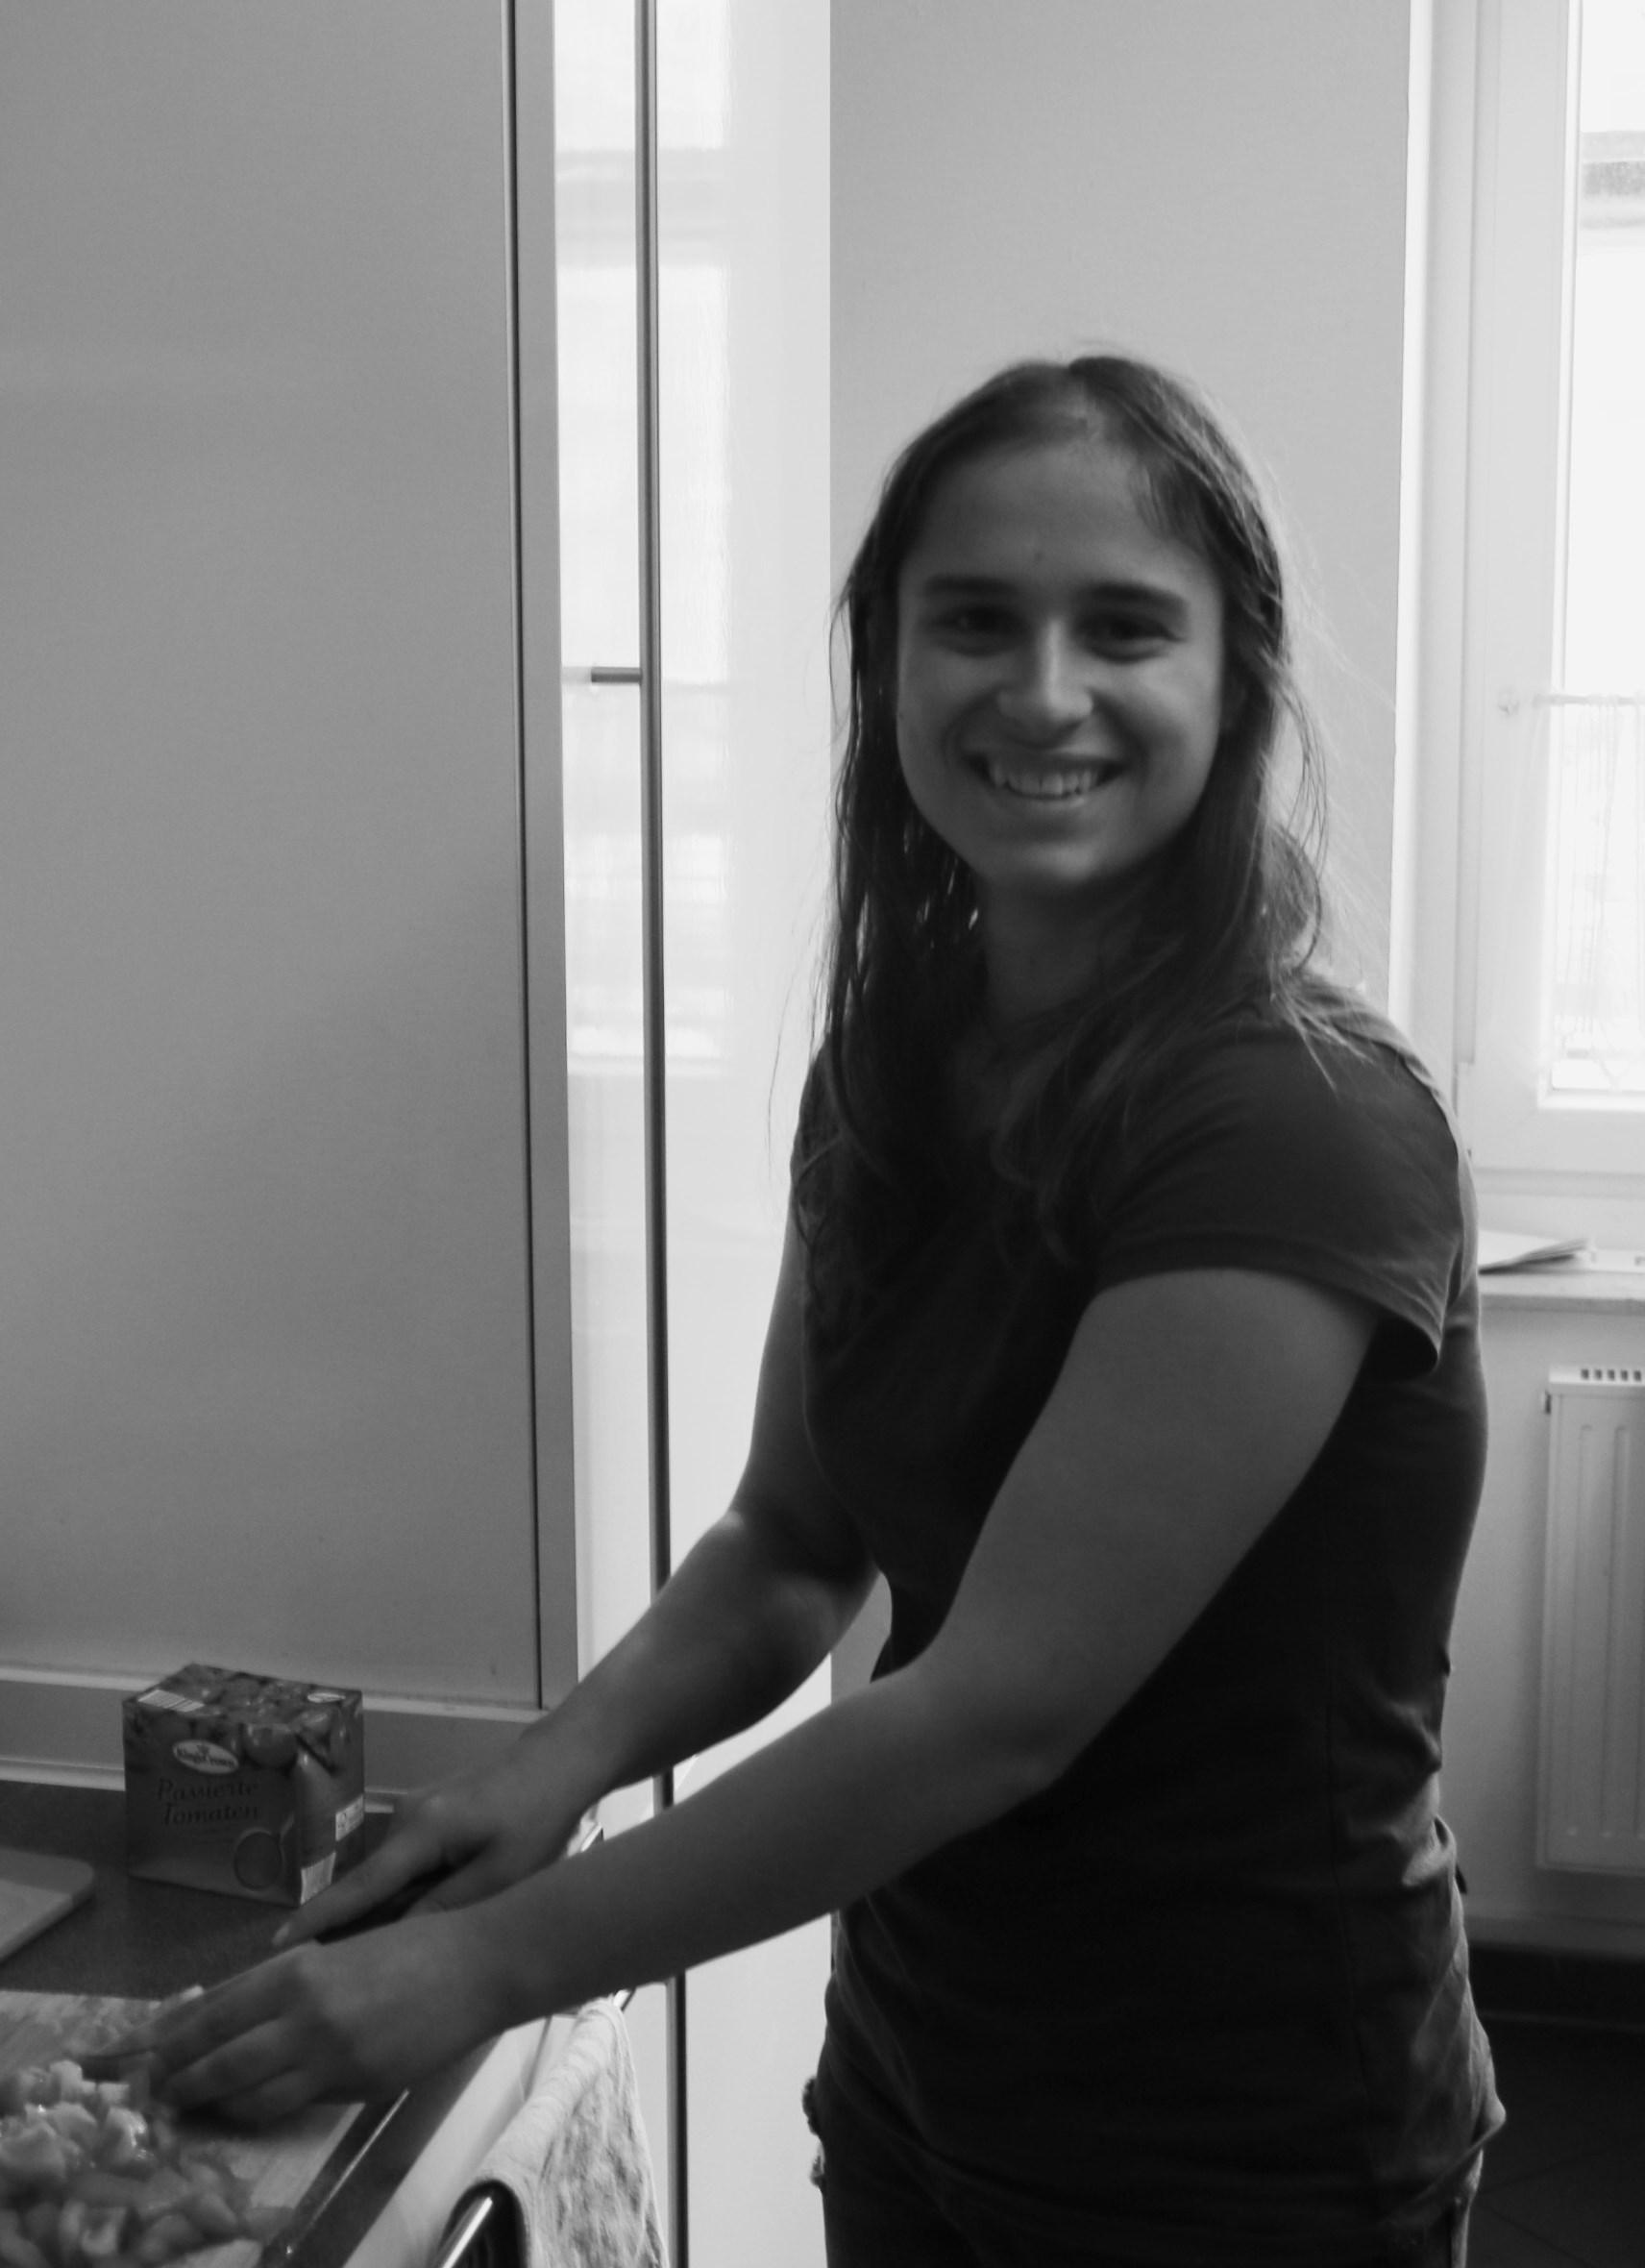 Angela Fukova